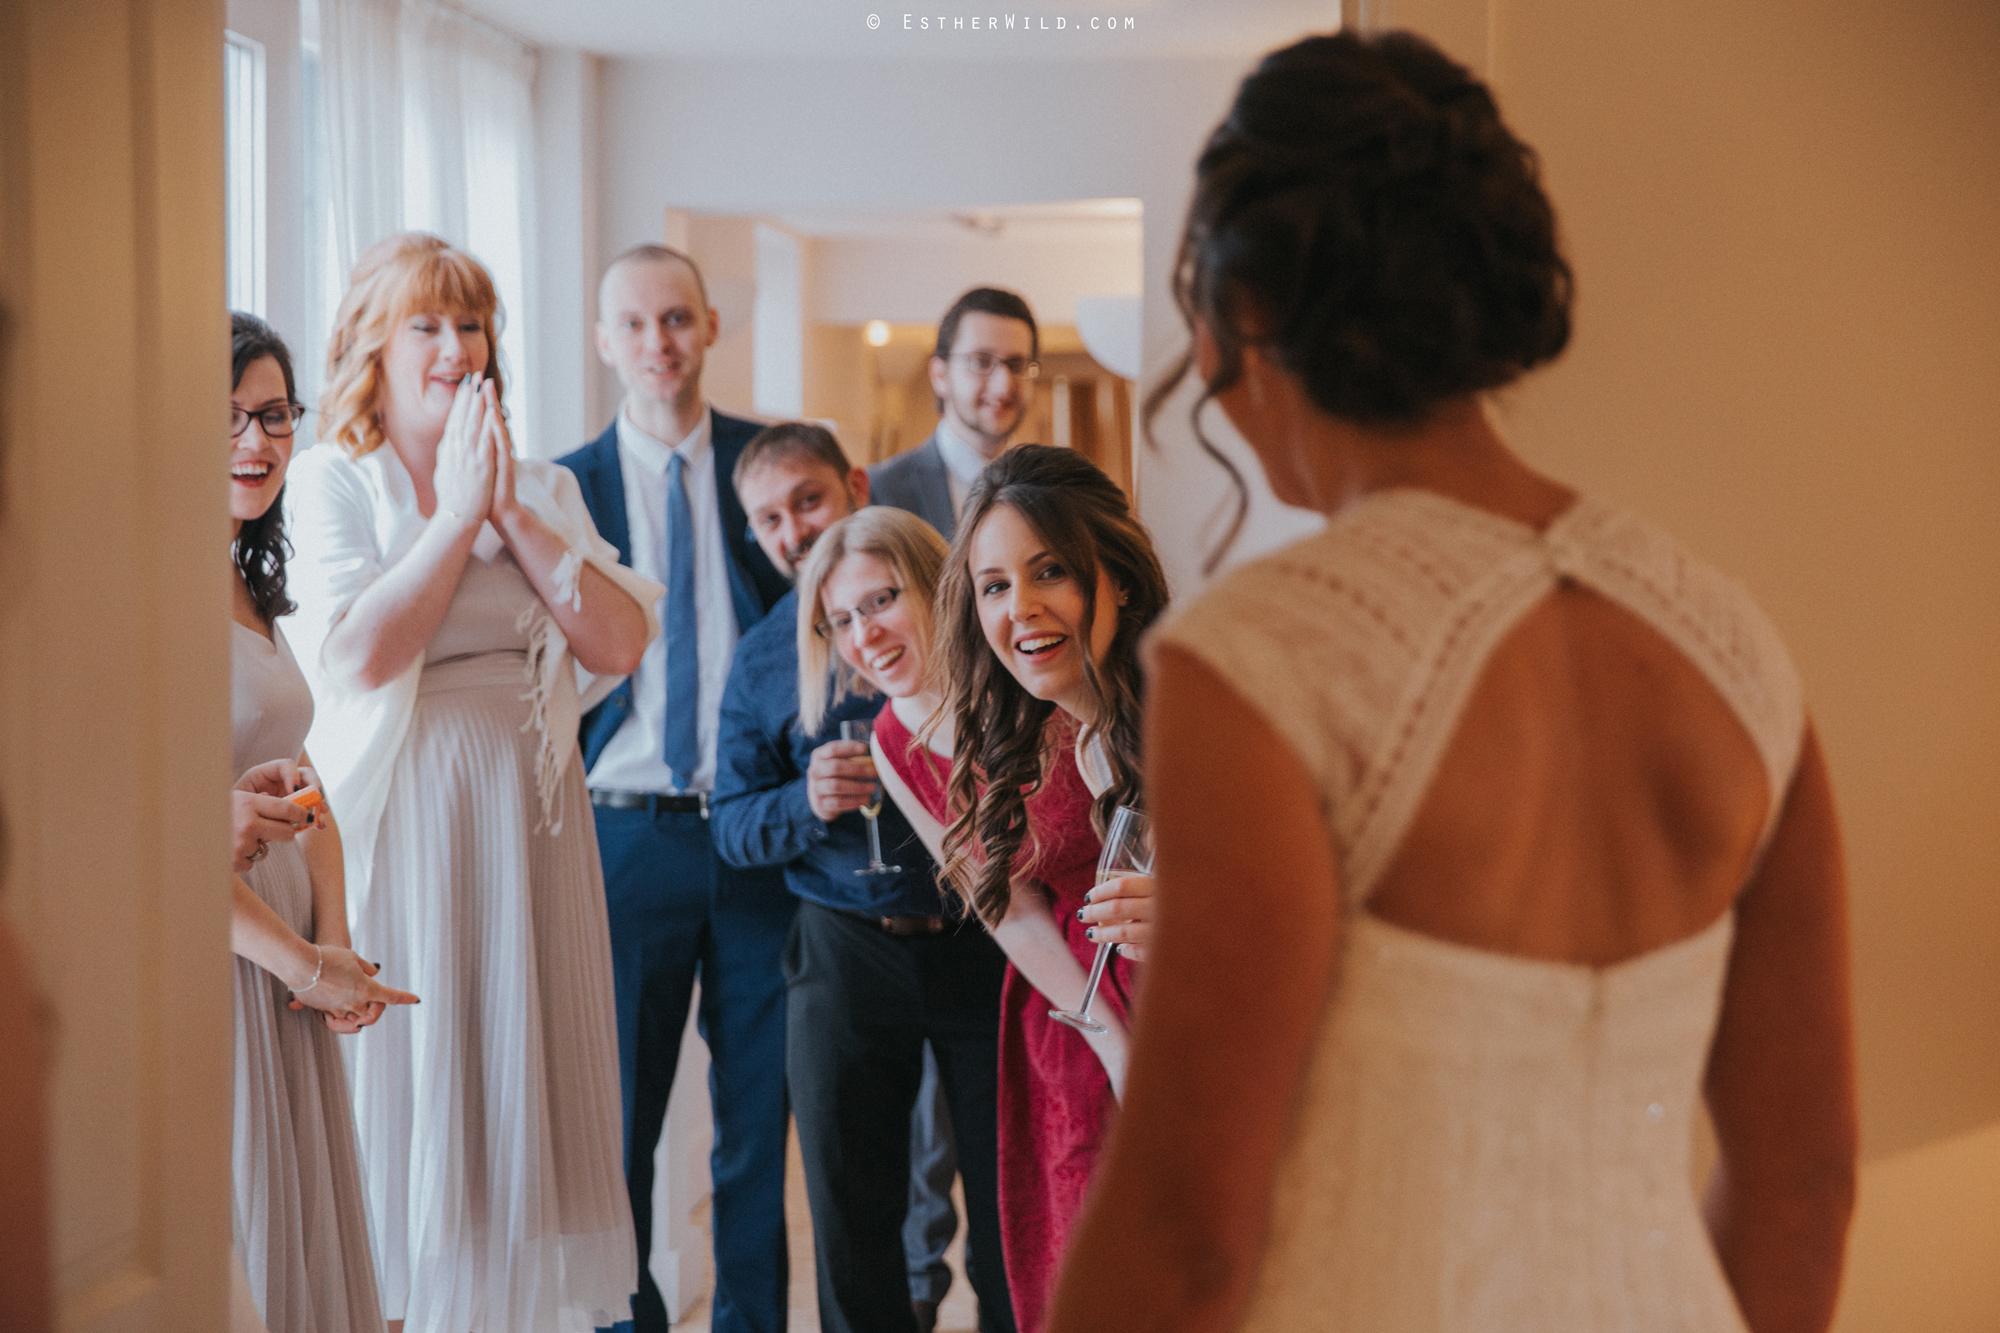 Elms_Barn_Weddings_Suffolk_Photographer_Copyright_Esther_Wild_IMG_0736.jpg